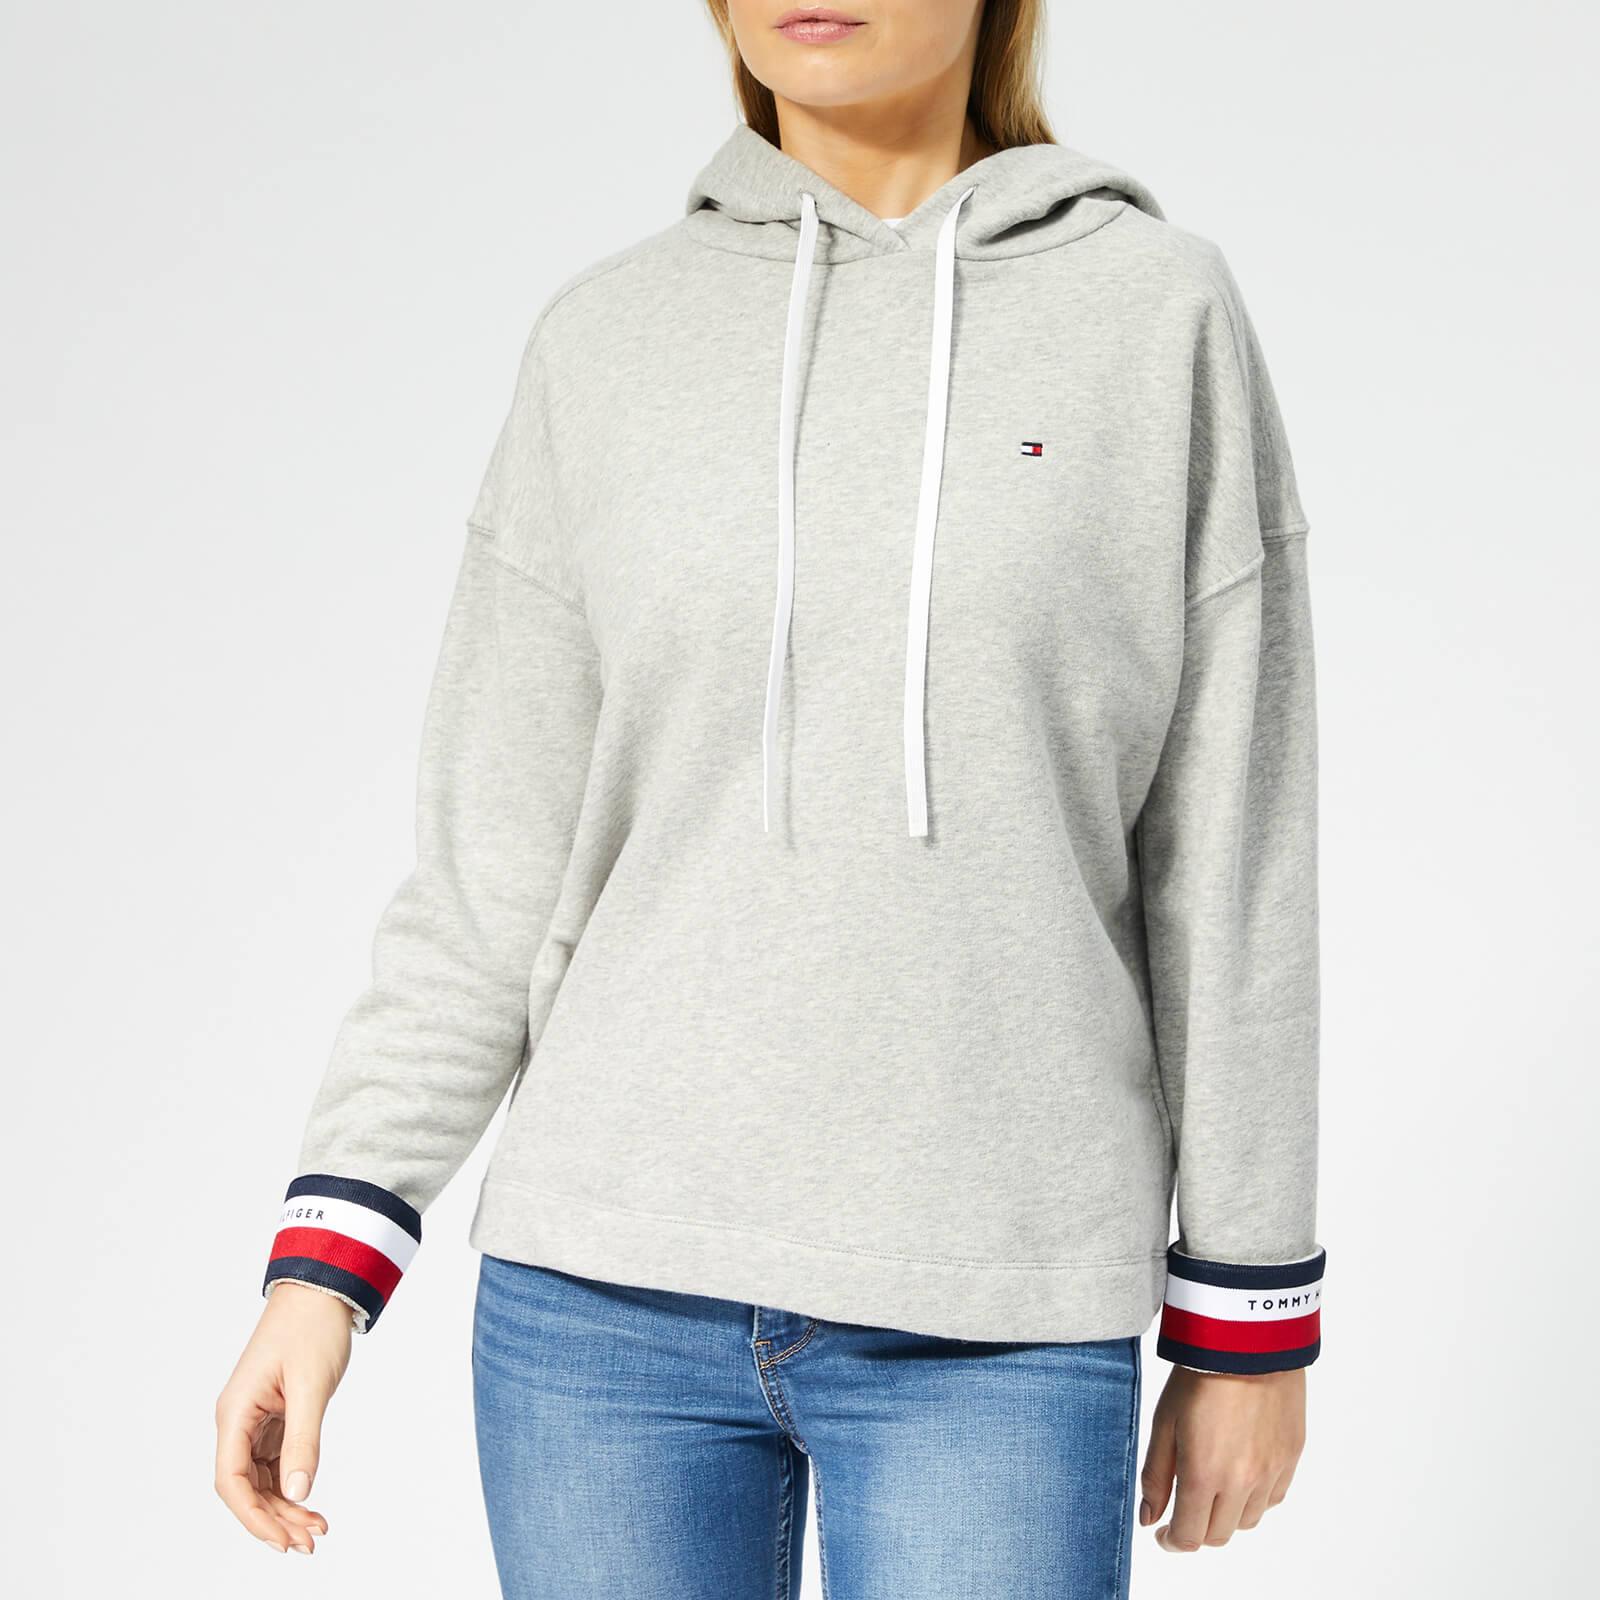 d70cfba3d Tommy Hilfiger Women's Valina Hoodie - Light Grey Htr Womens Clothing |  TheHut.com